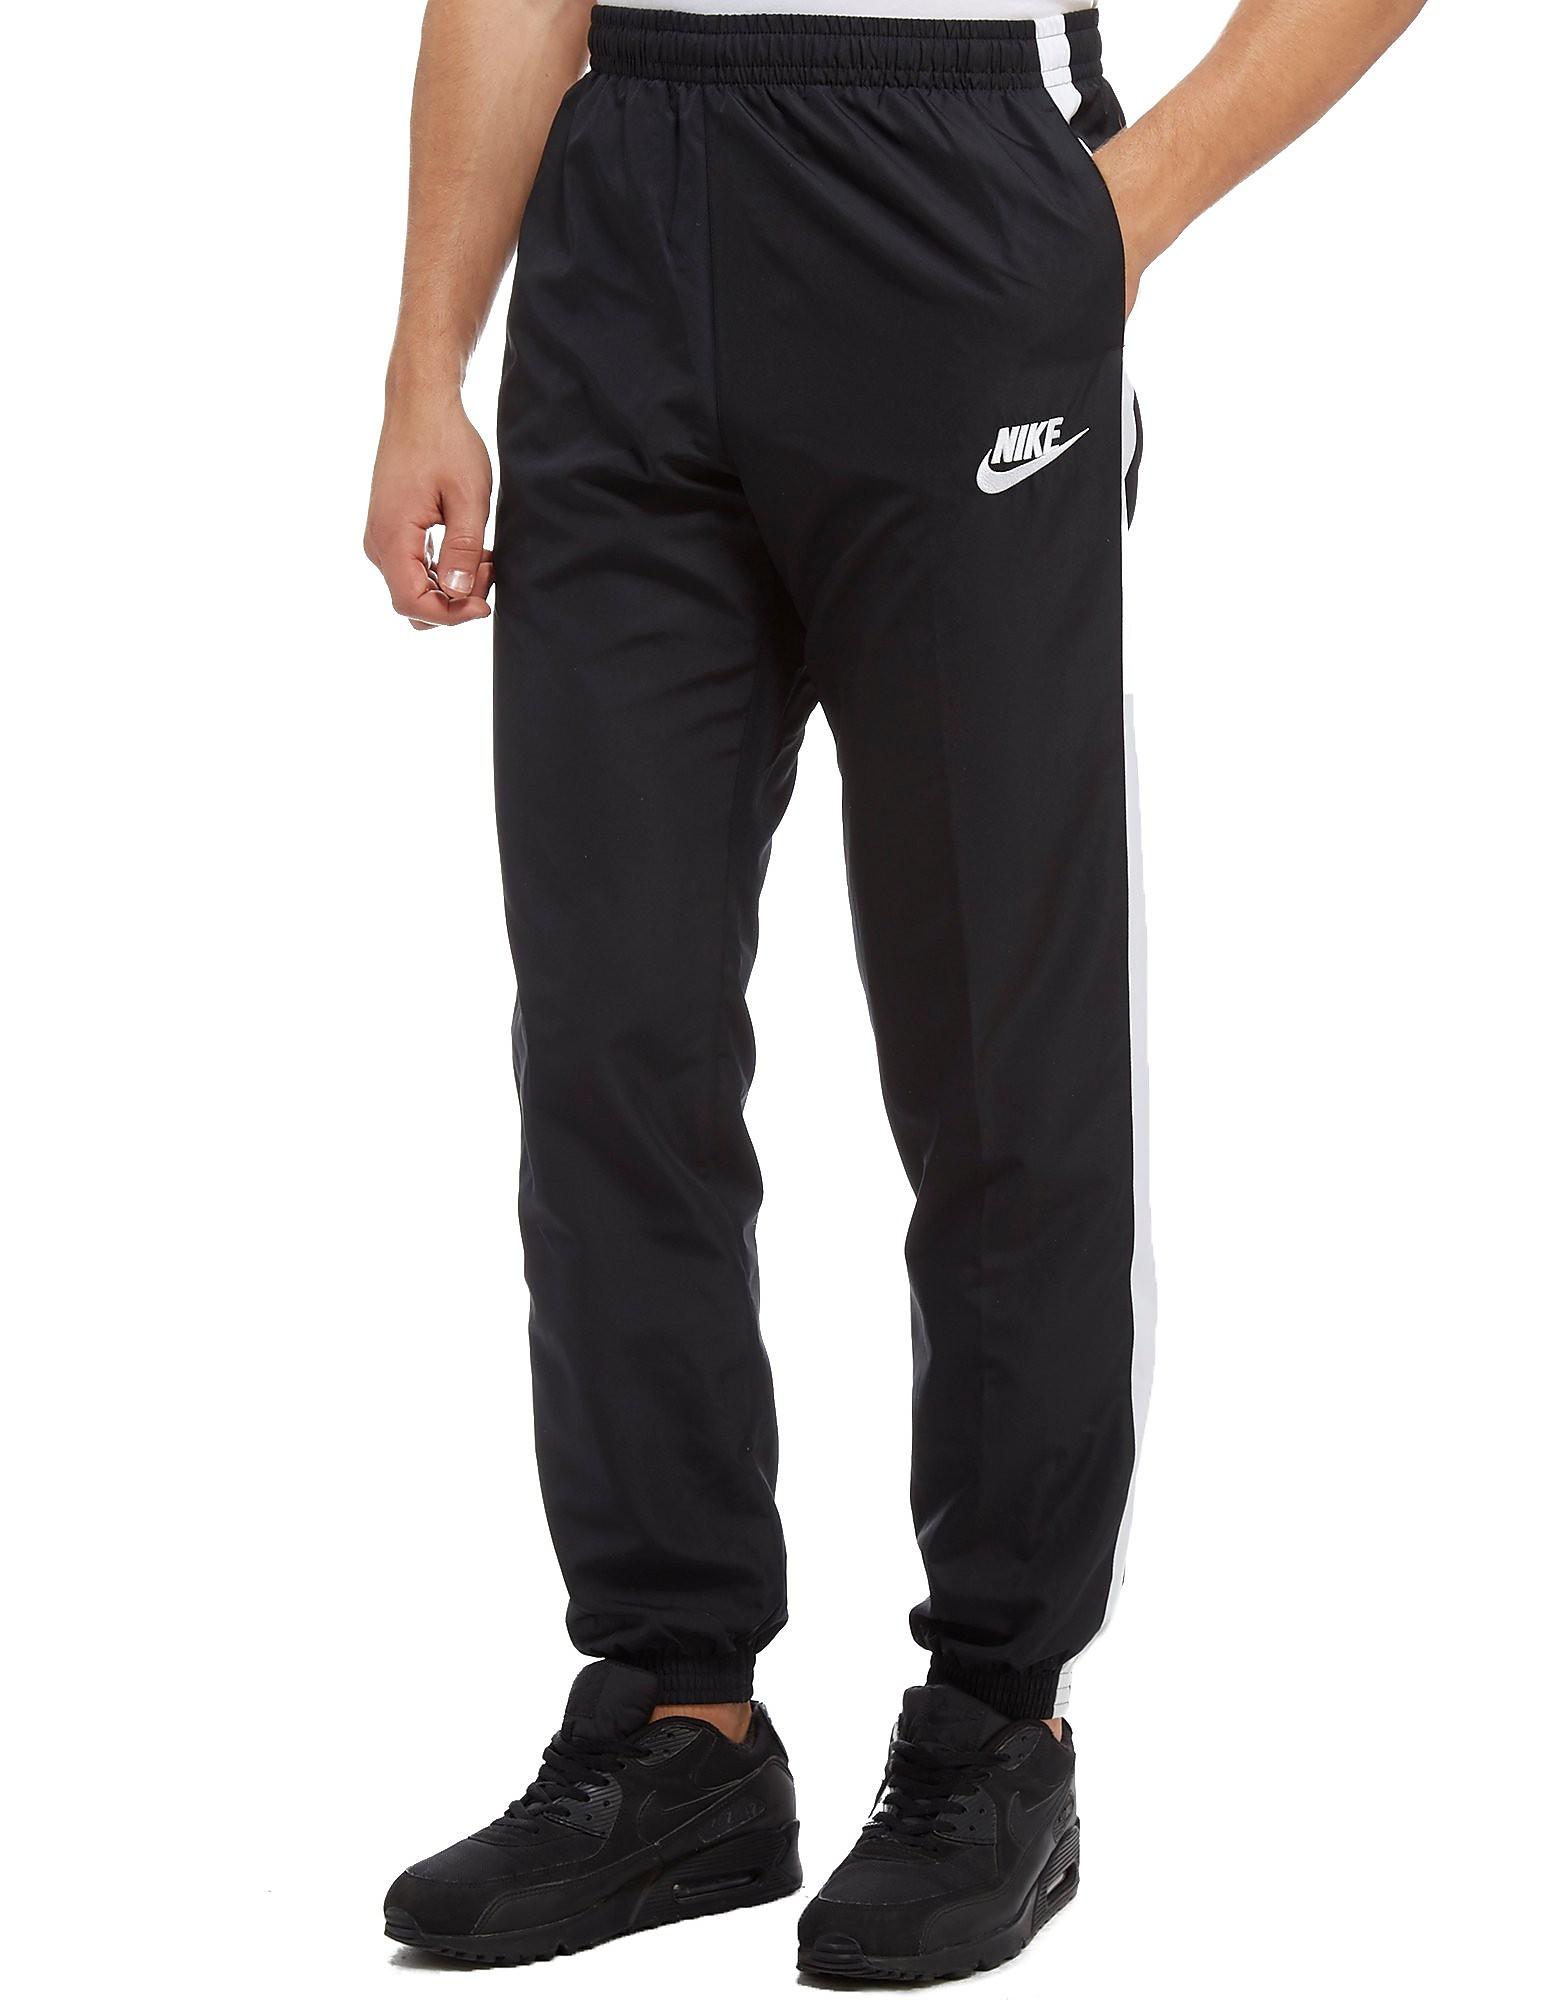 Nike Rocket Pants